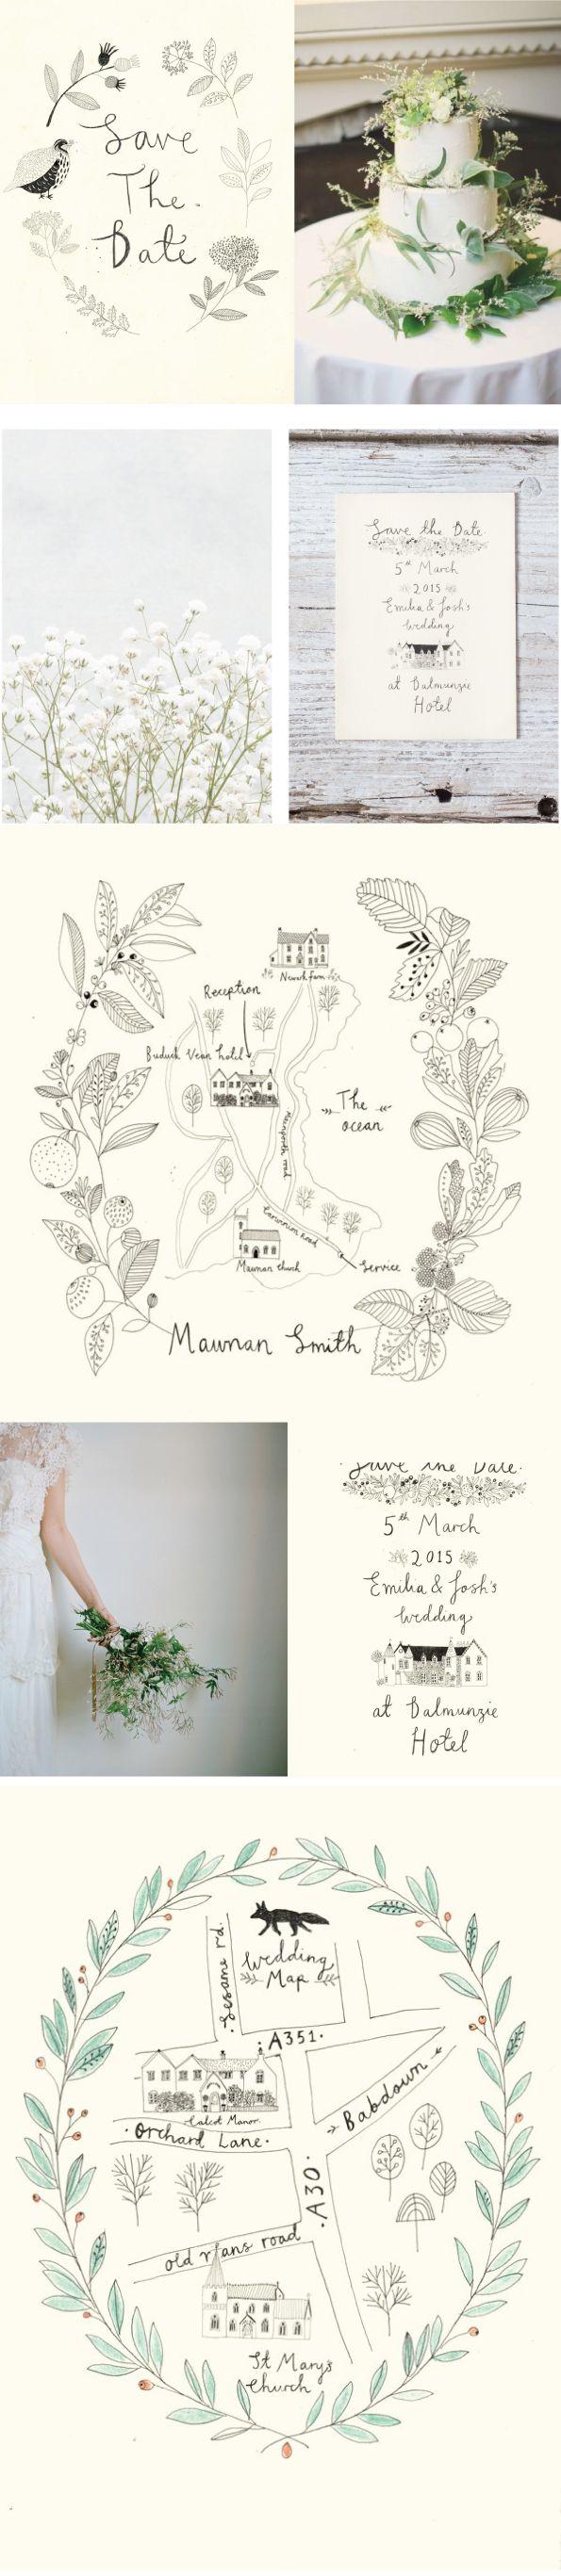 Katt Frank Wedding design. Love this idea. Include a map of www.weddingsatcrystalsprings.com